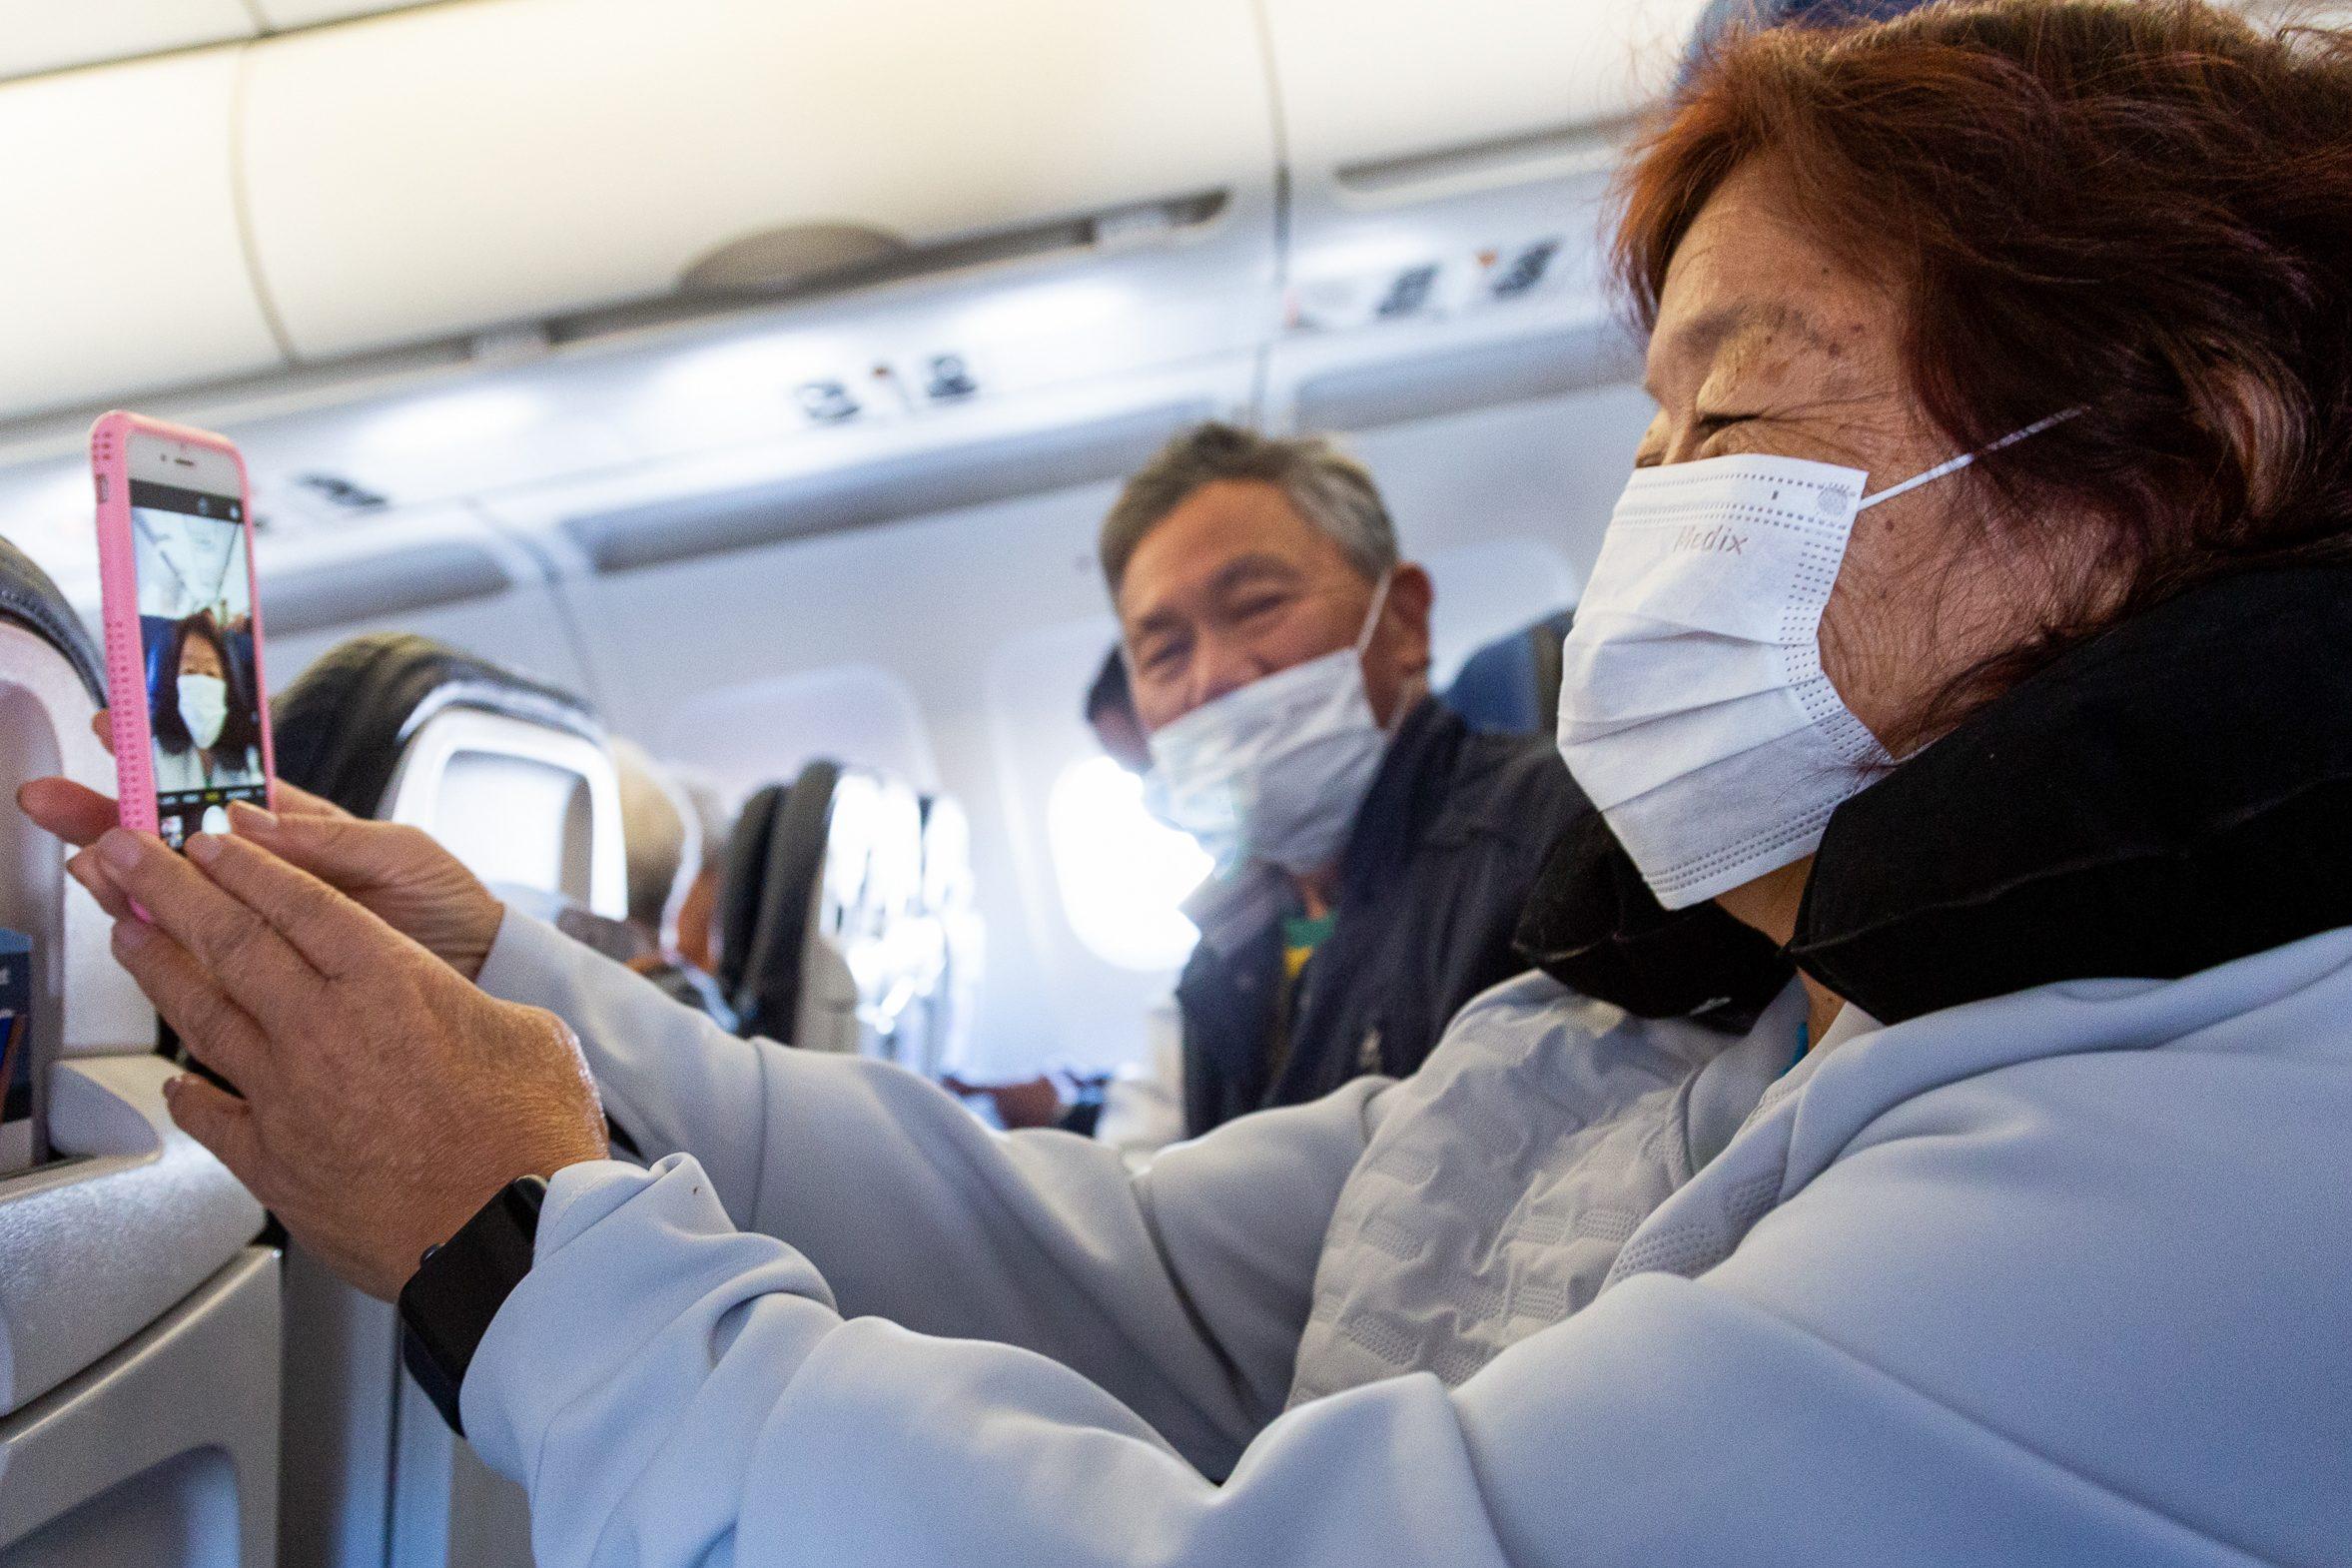 Precautionary Measures Being Taken at Airport in Phoenix